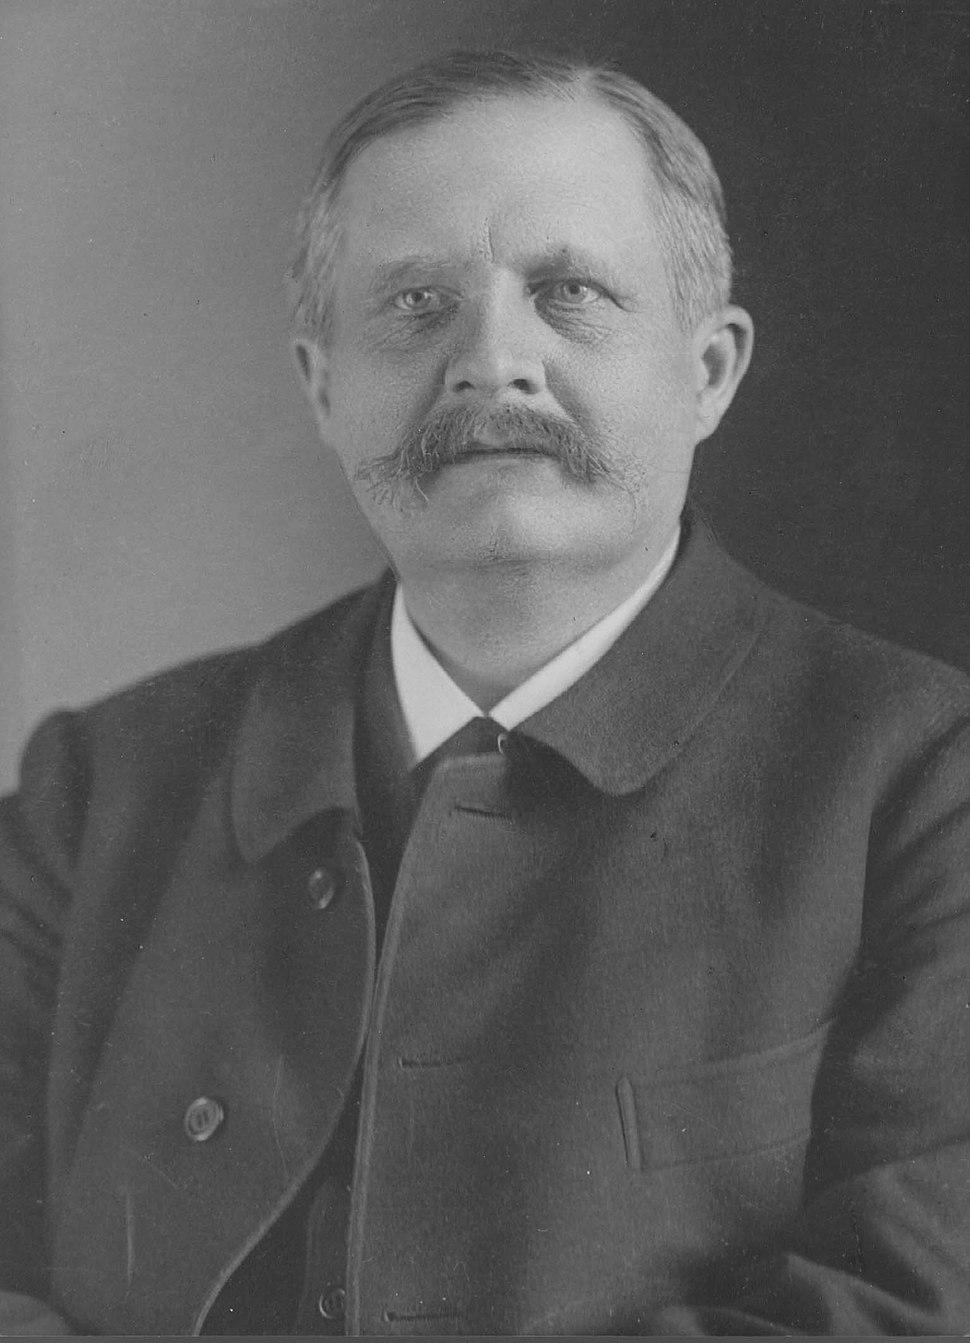 Portrait Friedrich Naumann (ca. 1911)